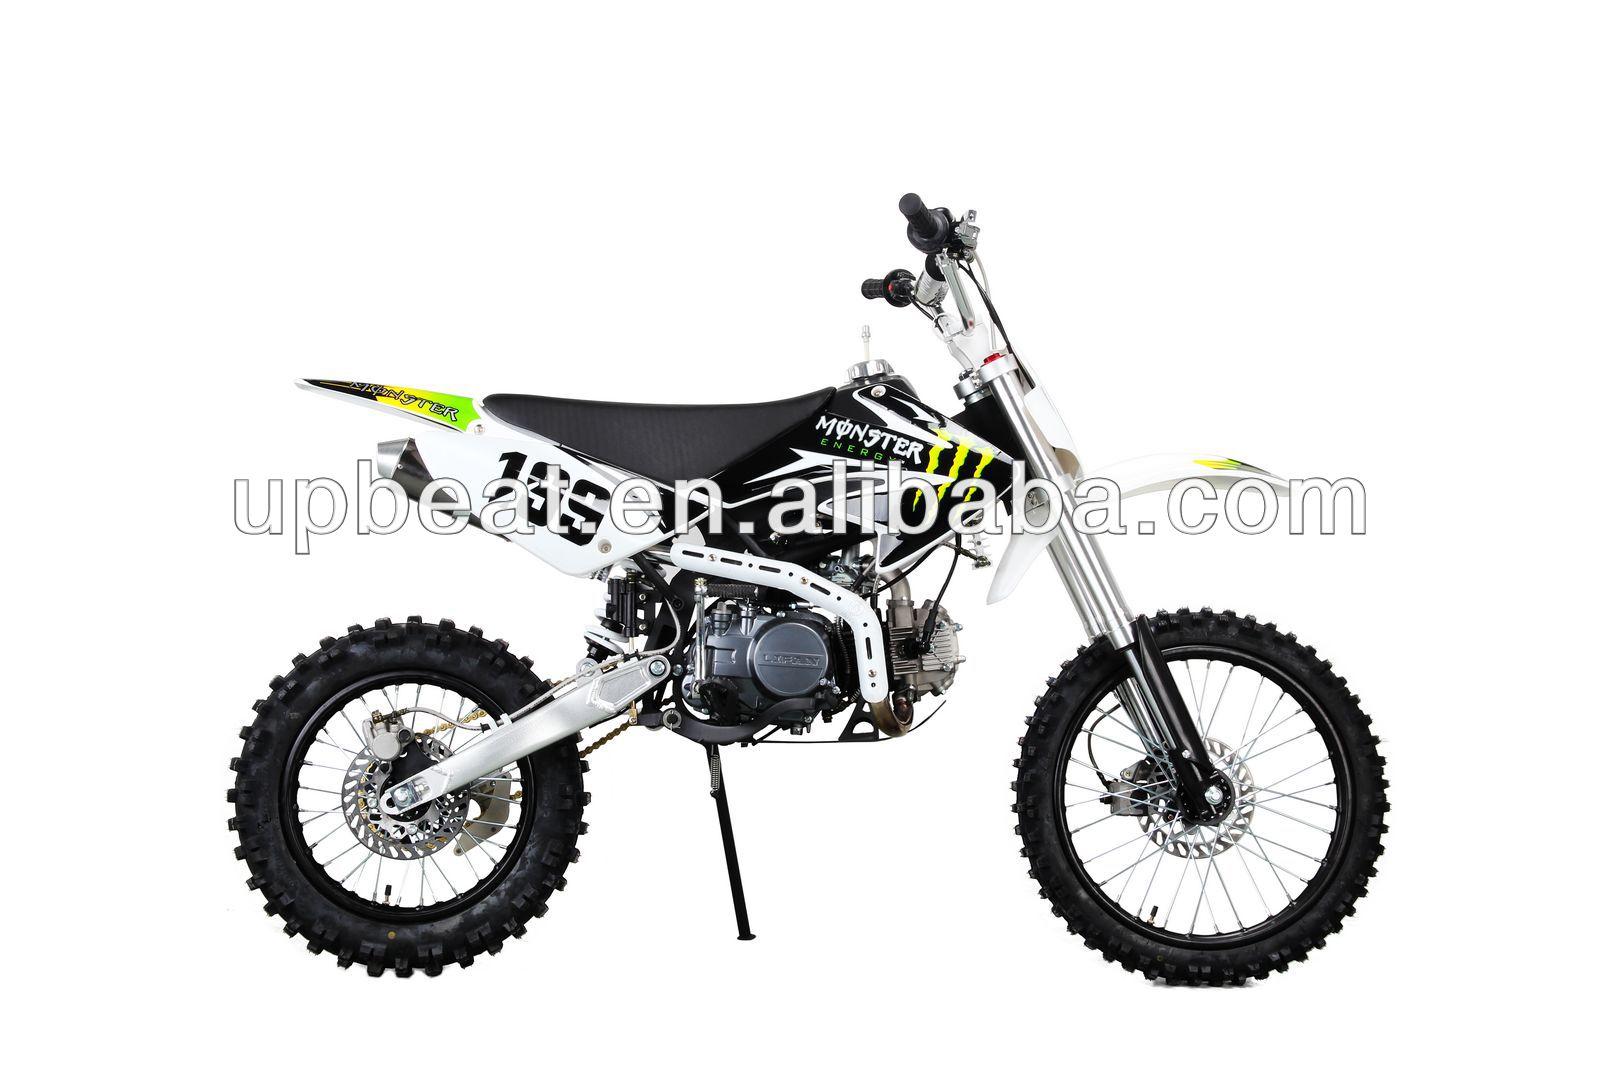 Pitpro 140cc Pitpro Dirt Bikes Pit Bike 140 Dirt Bike 140